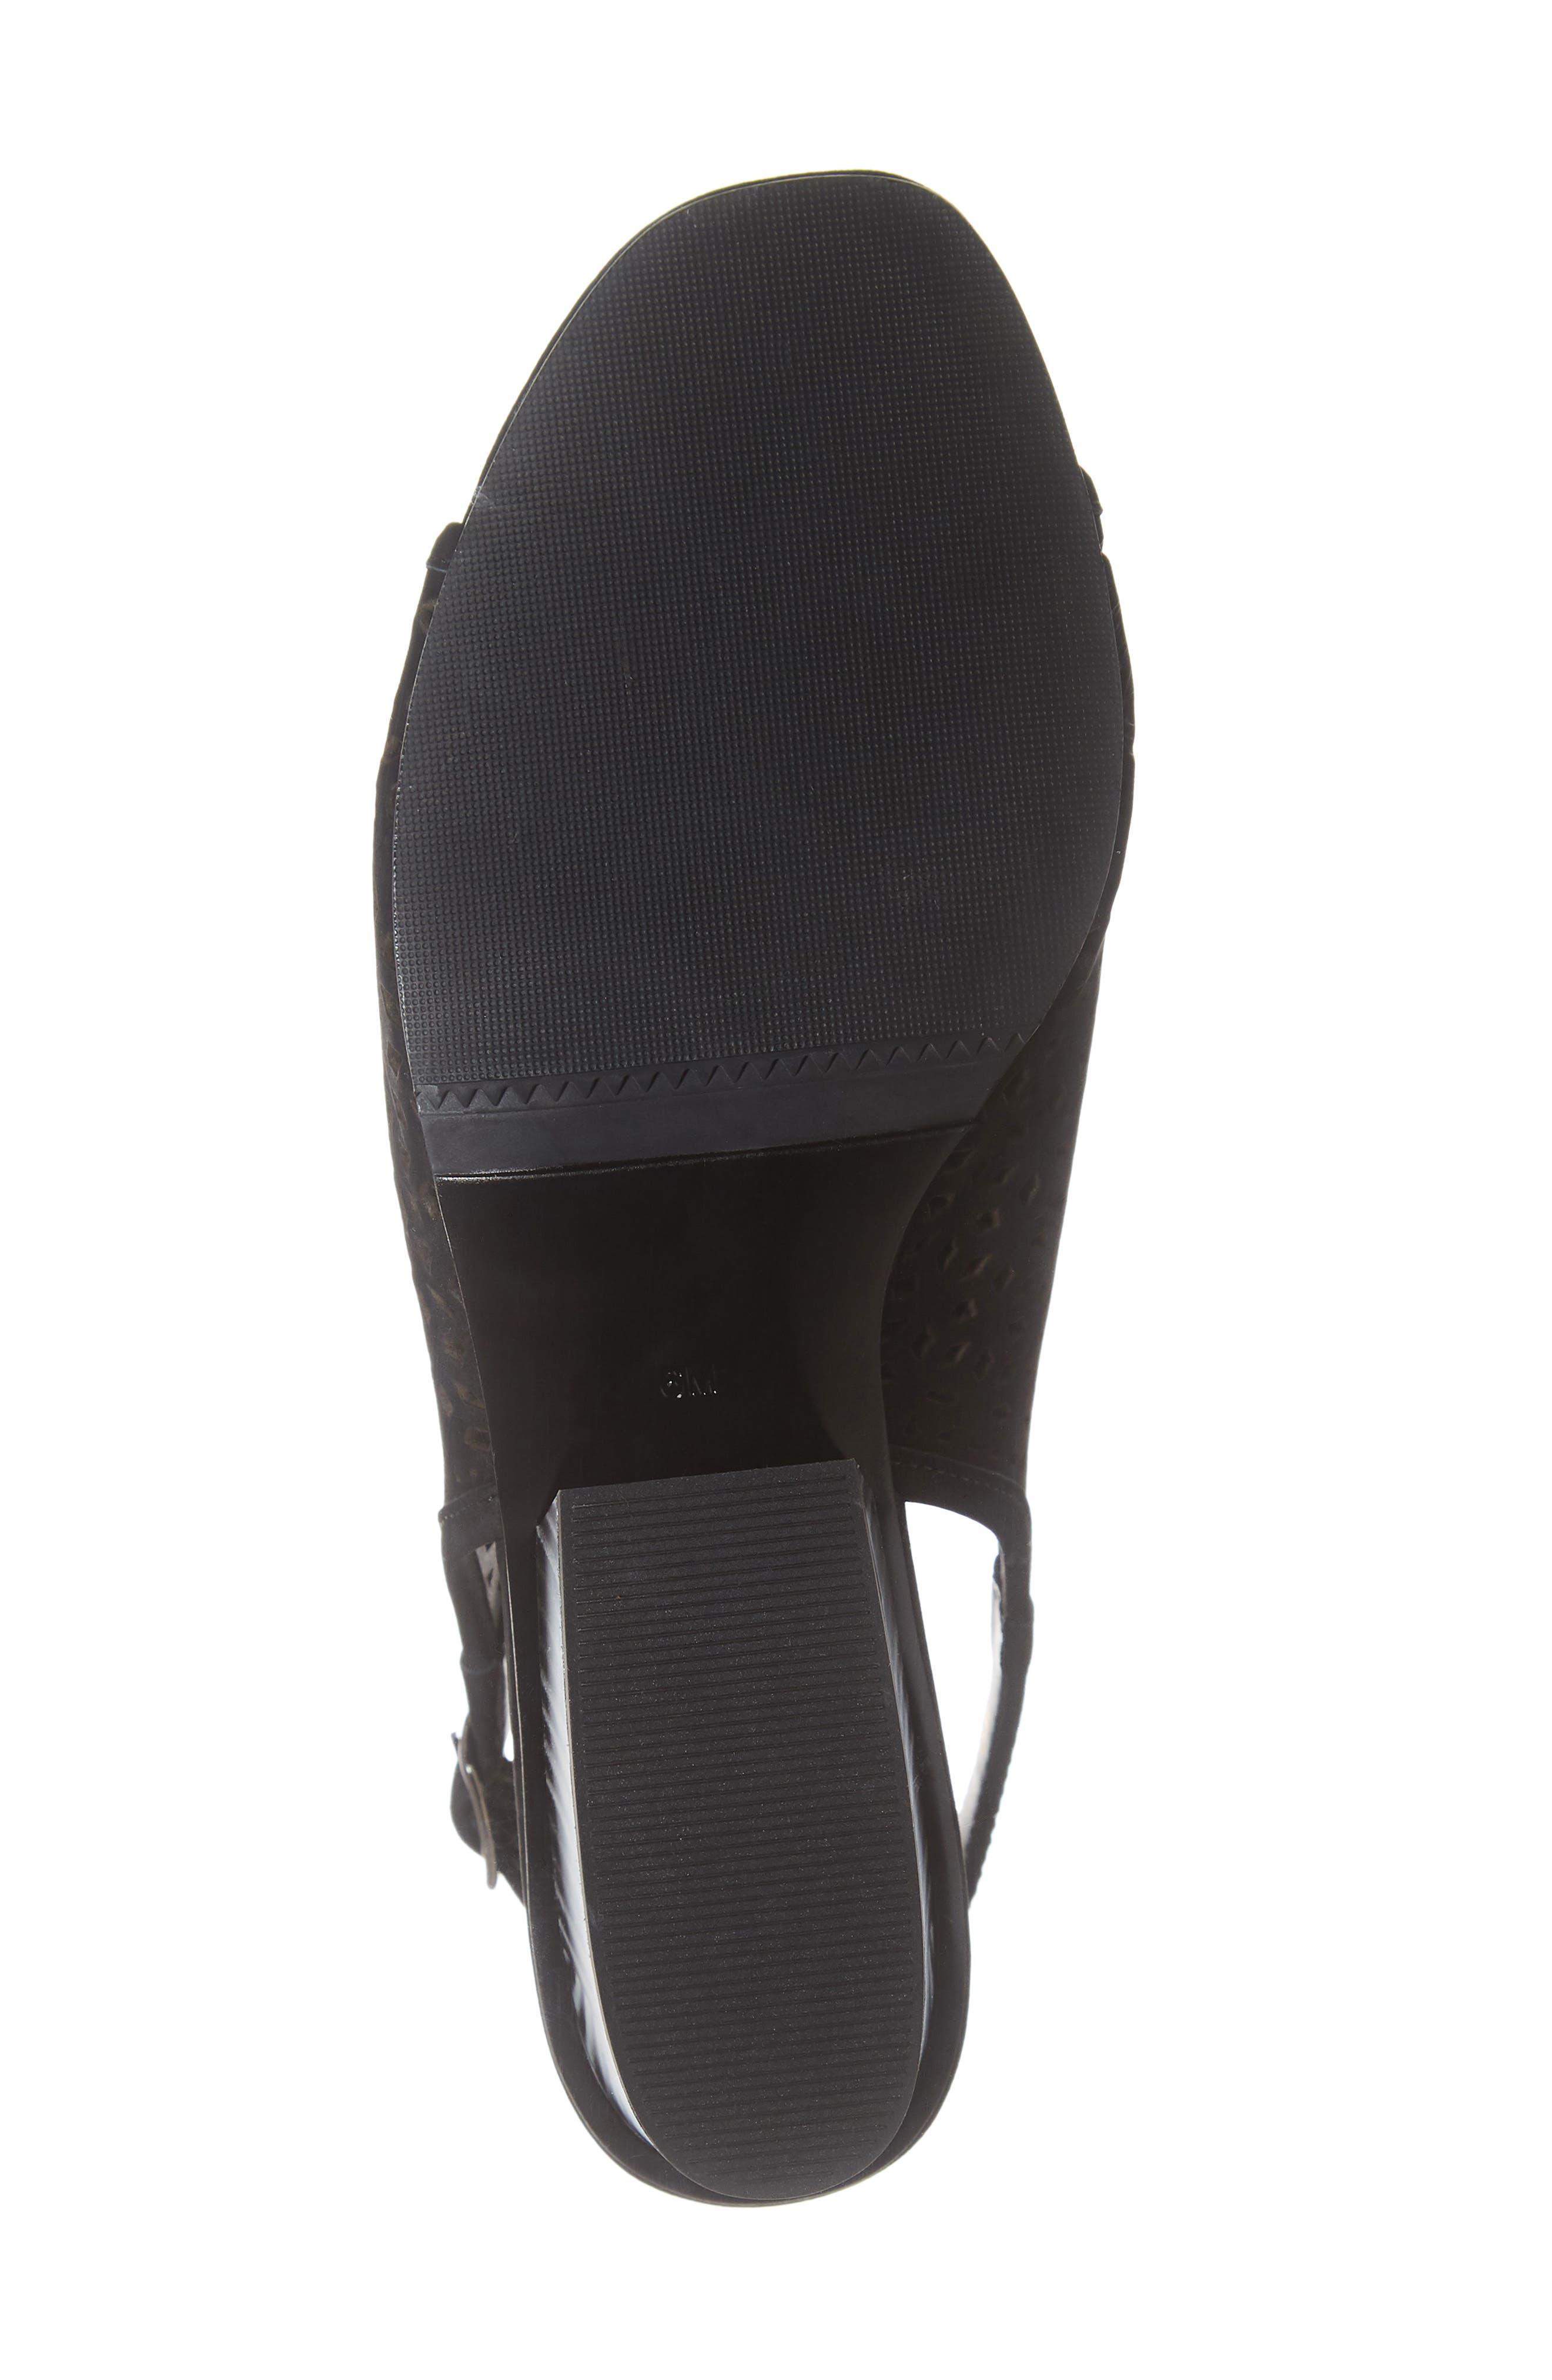 Candra Perforated Sandal,                             Alternate thumbnail 6, color,                             BLACK NUBUCK LEATHER